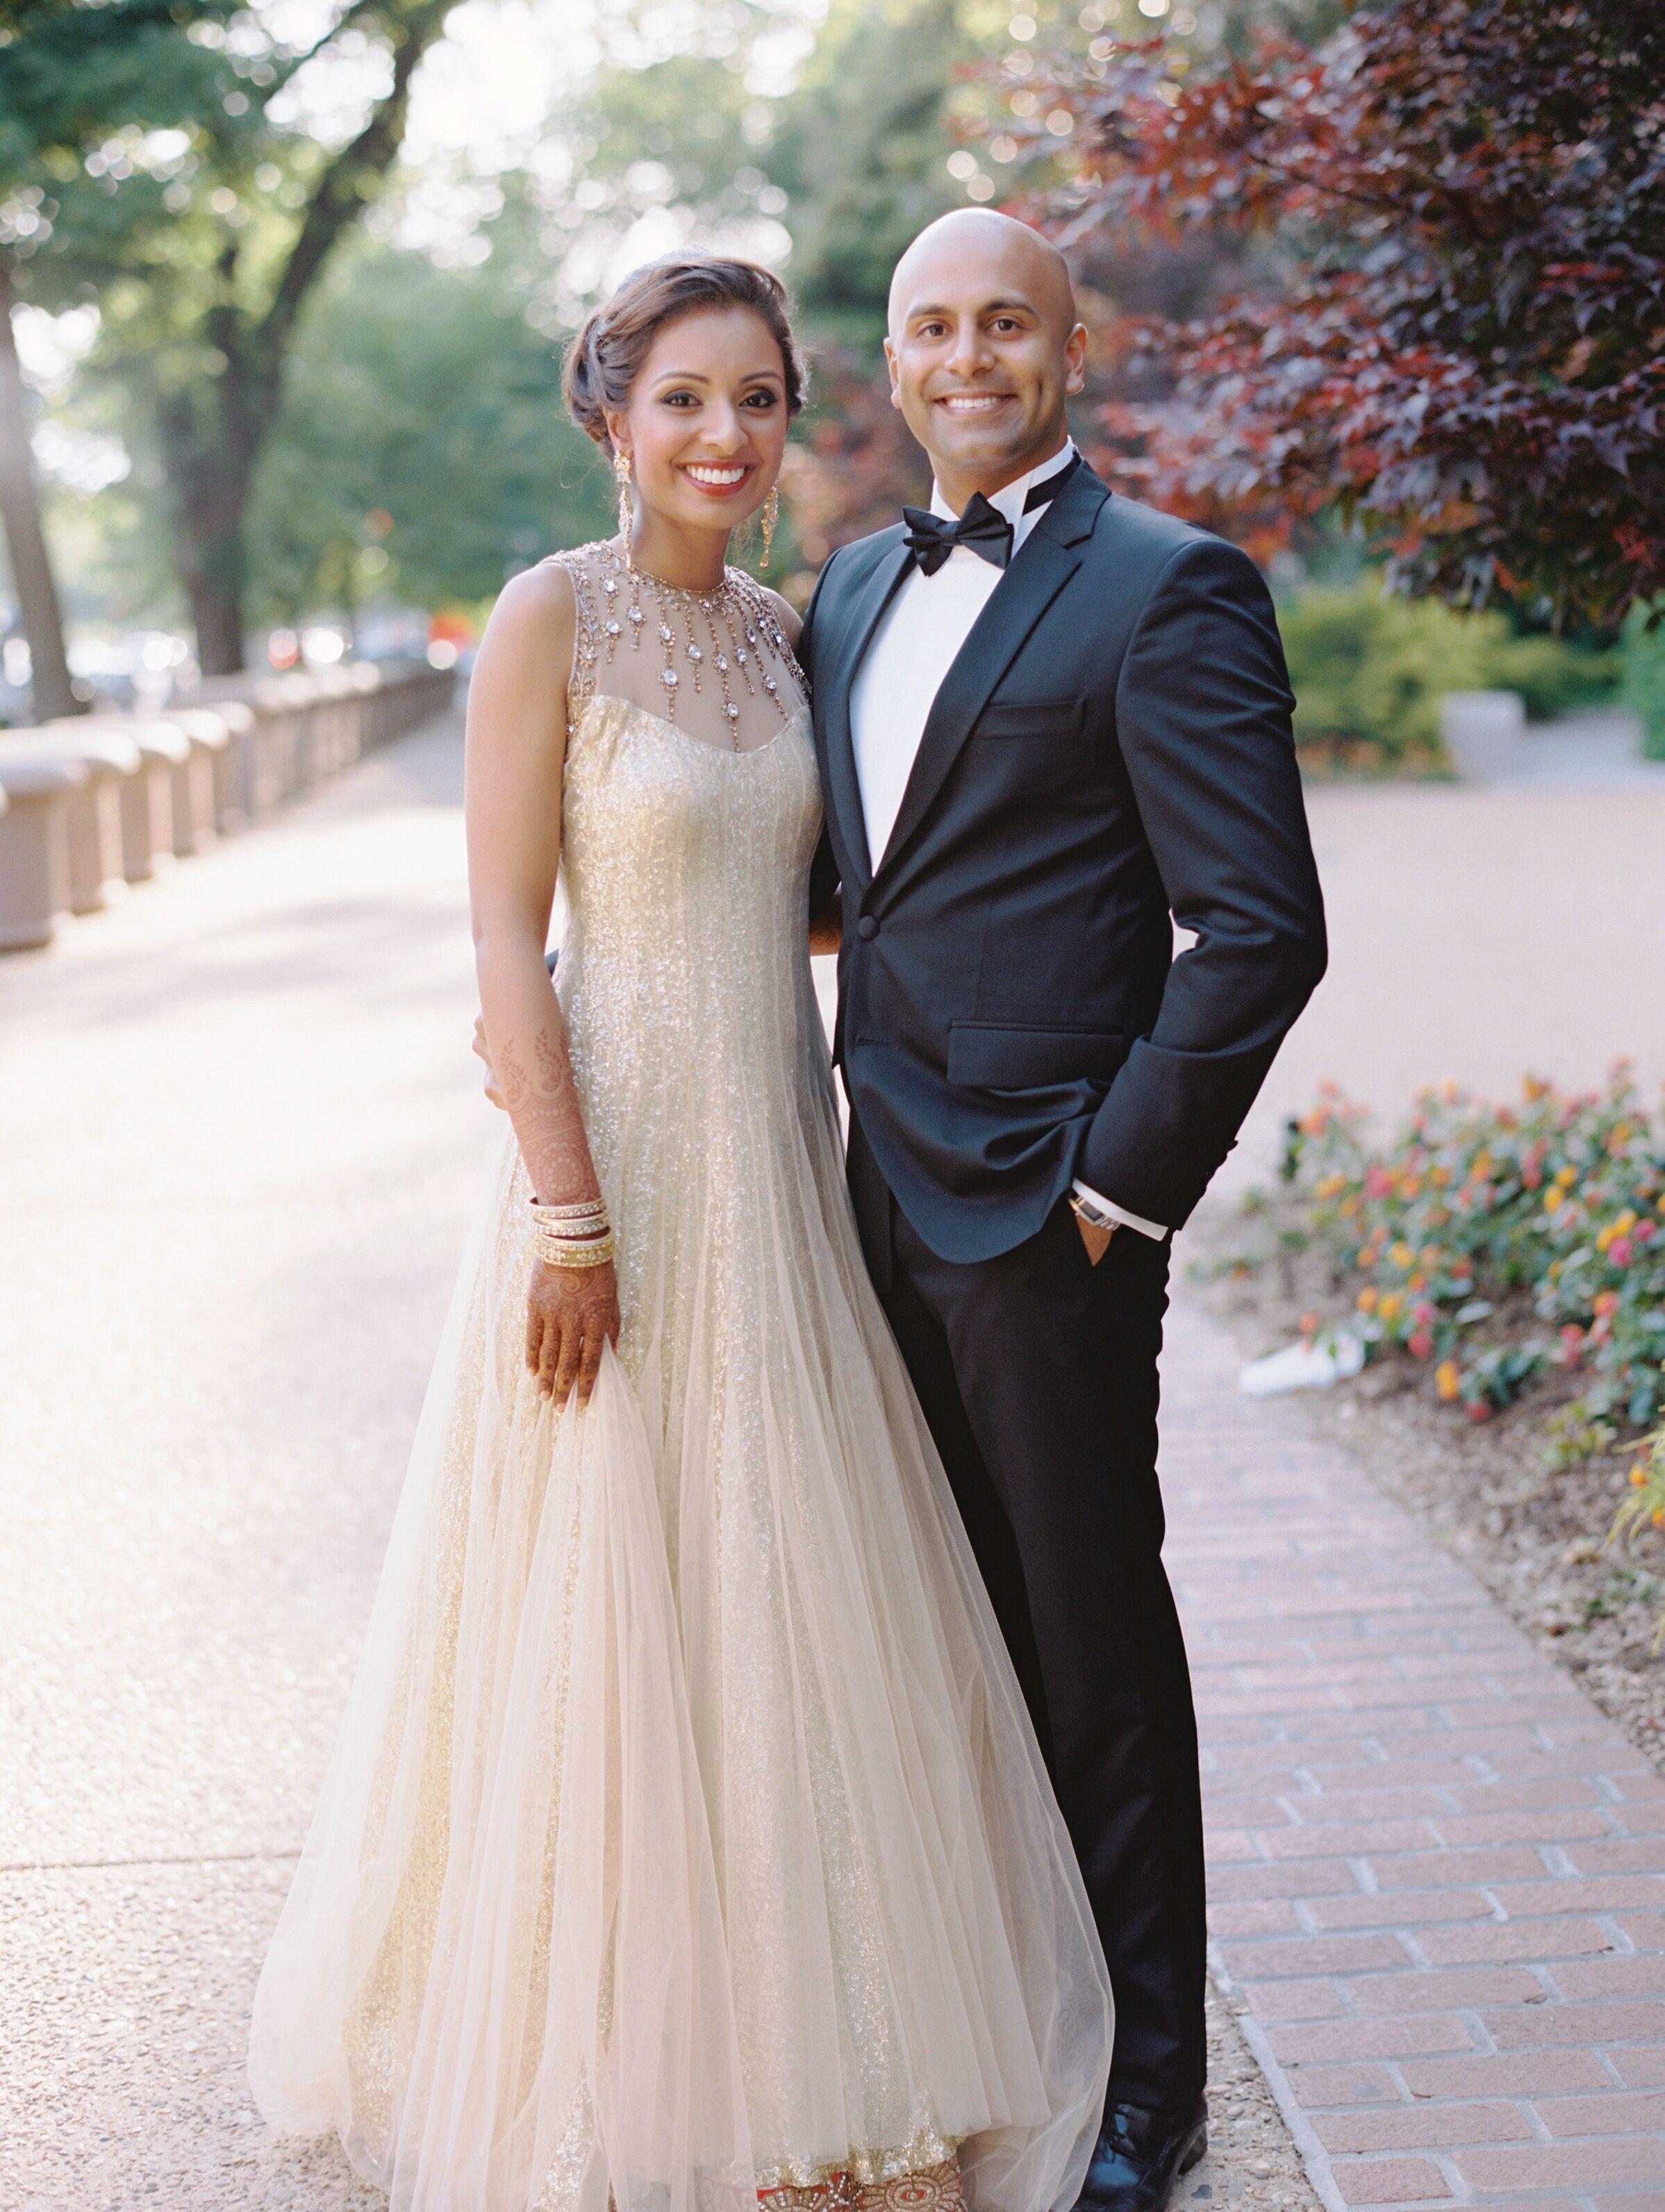 champagne wedding dress what color tuxedo champaign wedding dress Bride In A Champagne Gown Groom Black Tuxedo For Reception